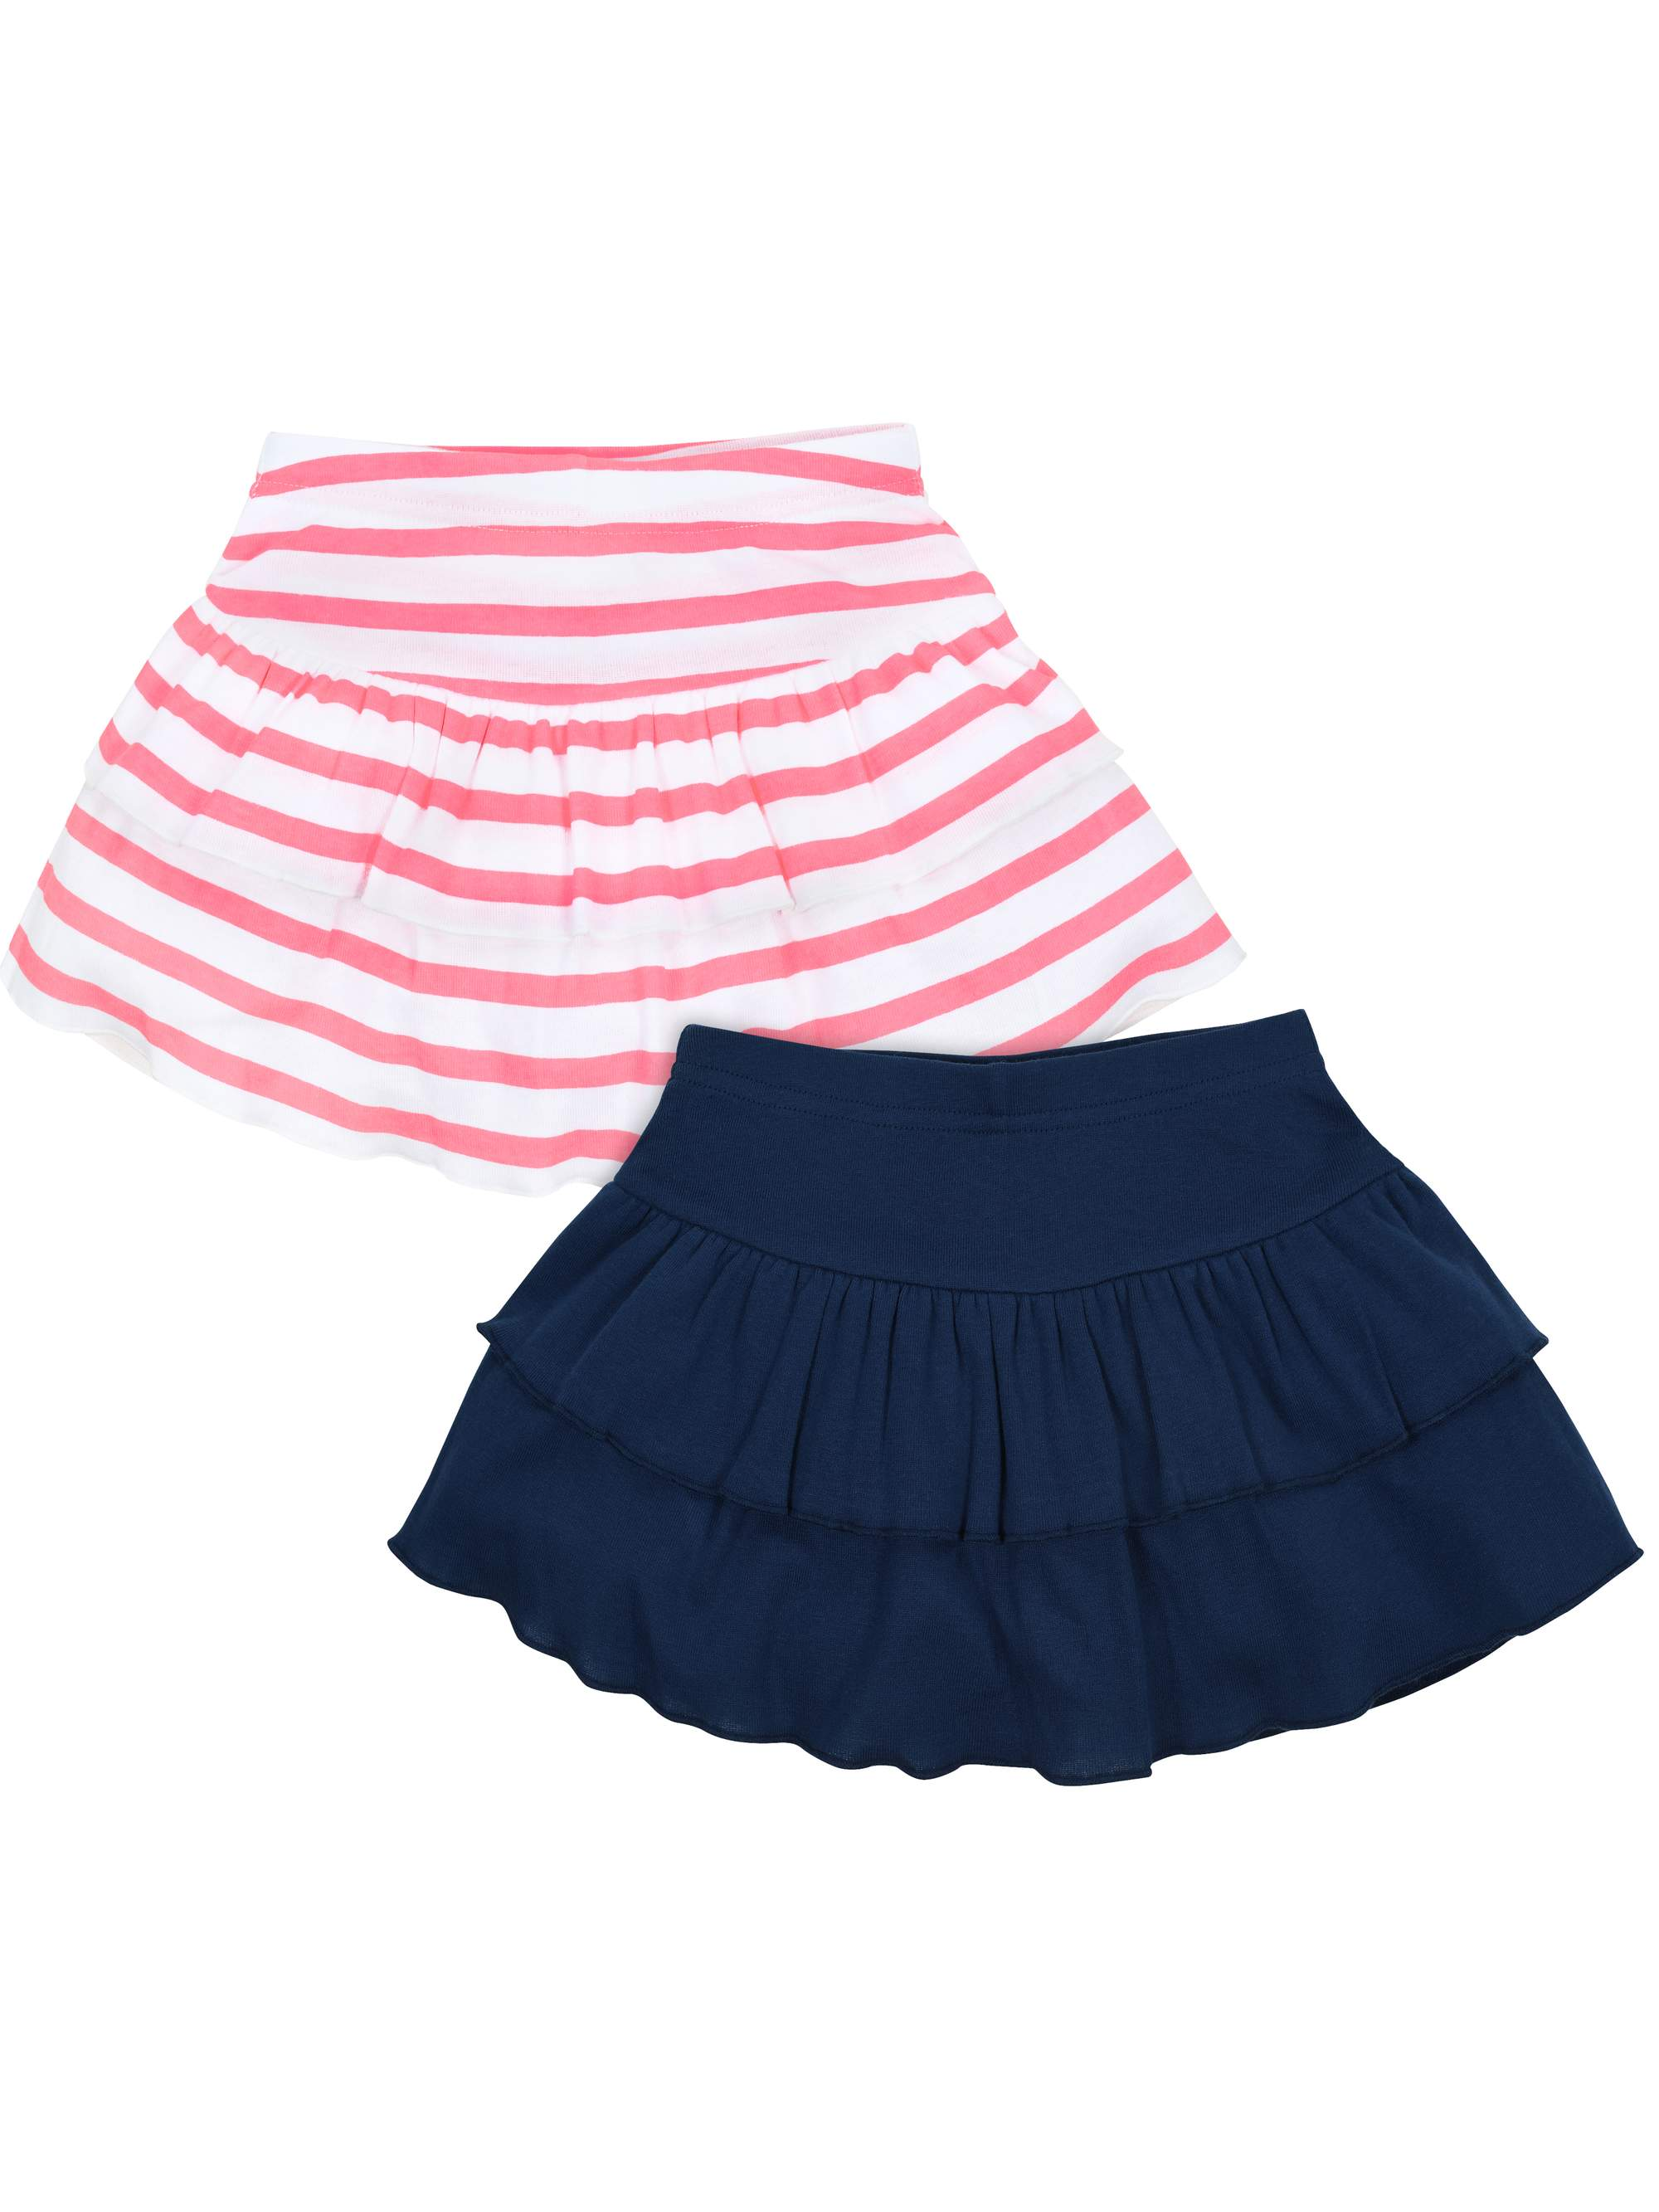 Pink Stripe & Navy Skorts, 2-pack (Baby Girls & Toddler Girls)